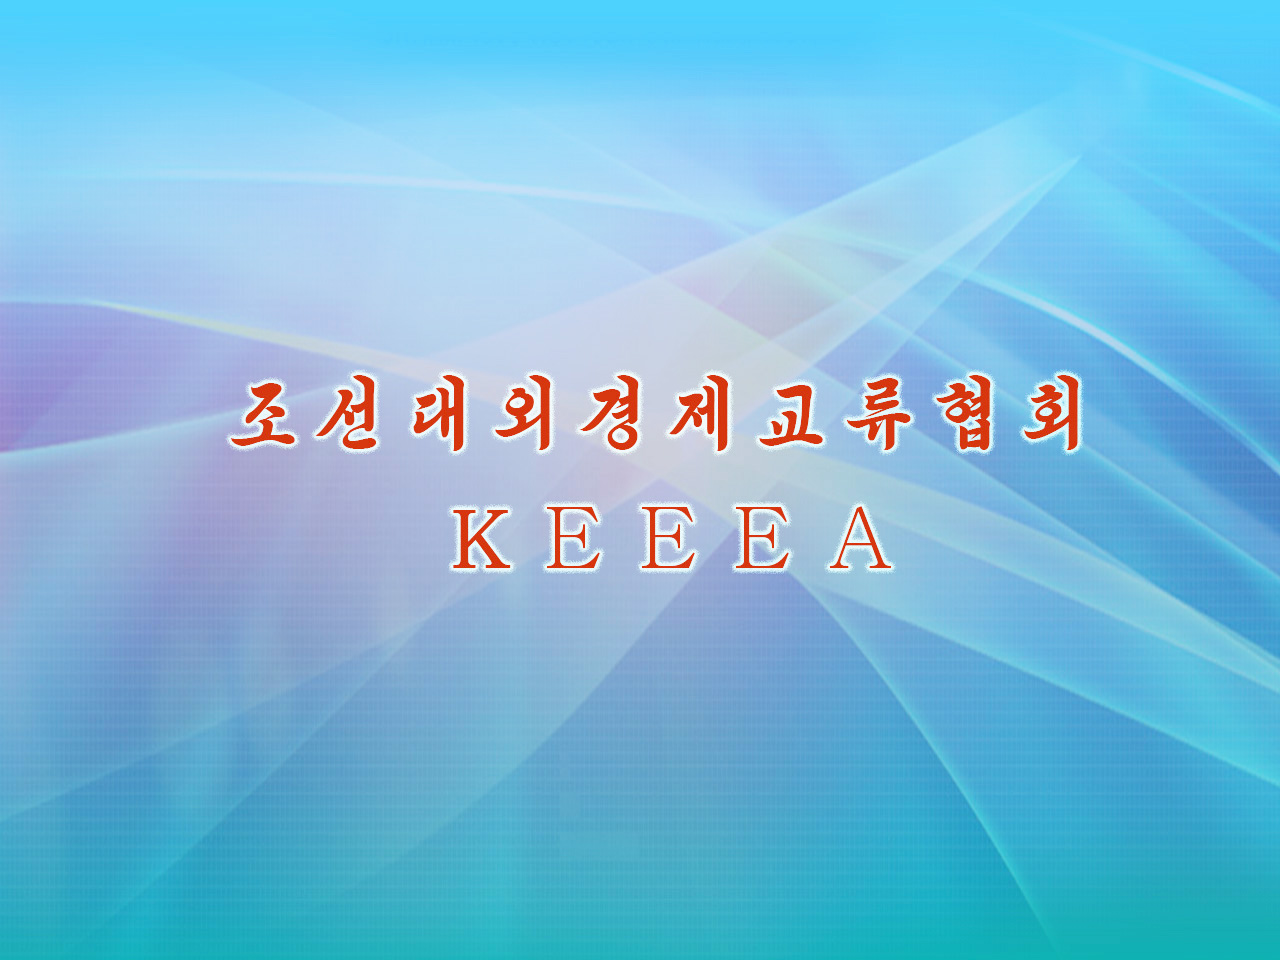 Korea External Economic Exchange Association